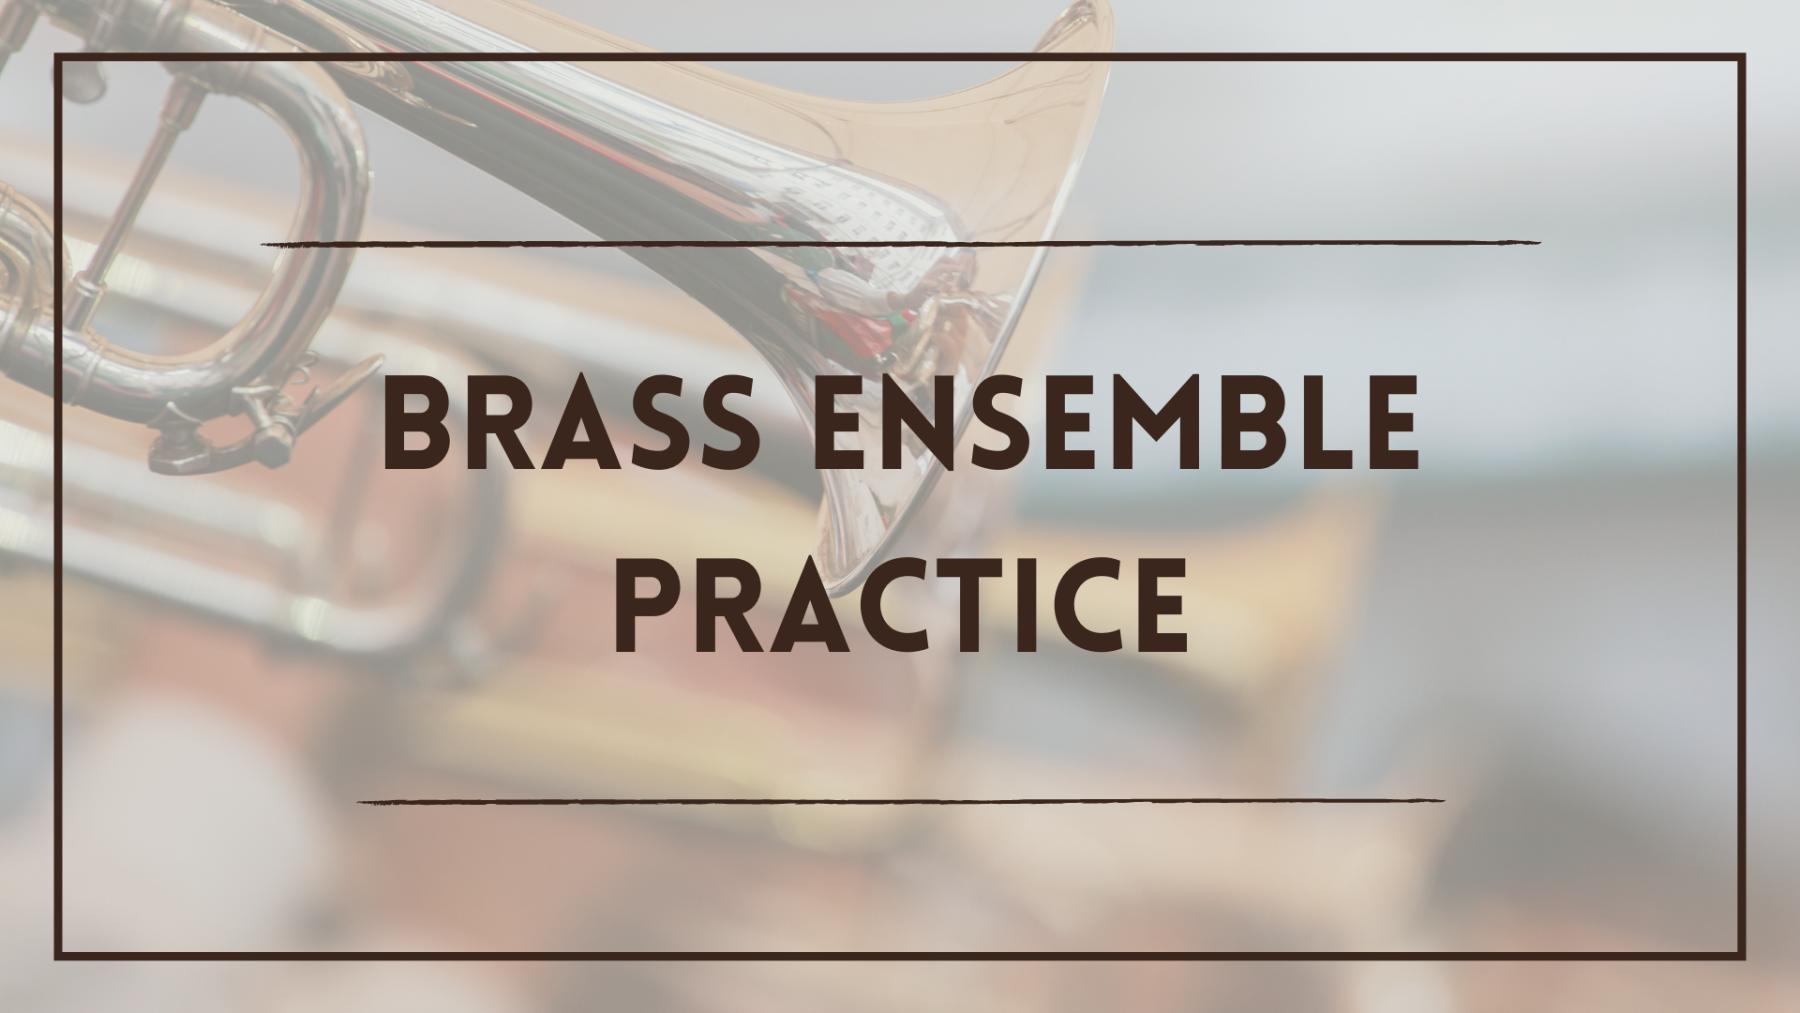 Brass Ensemble Practice